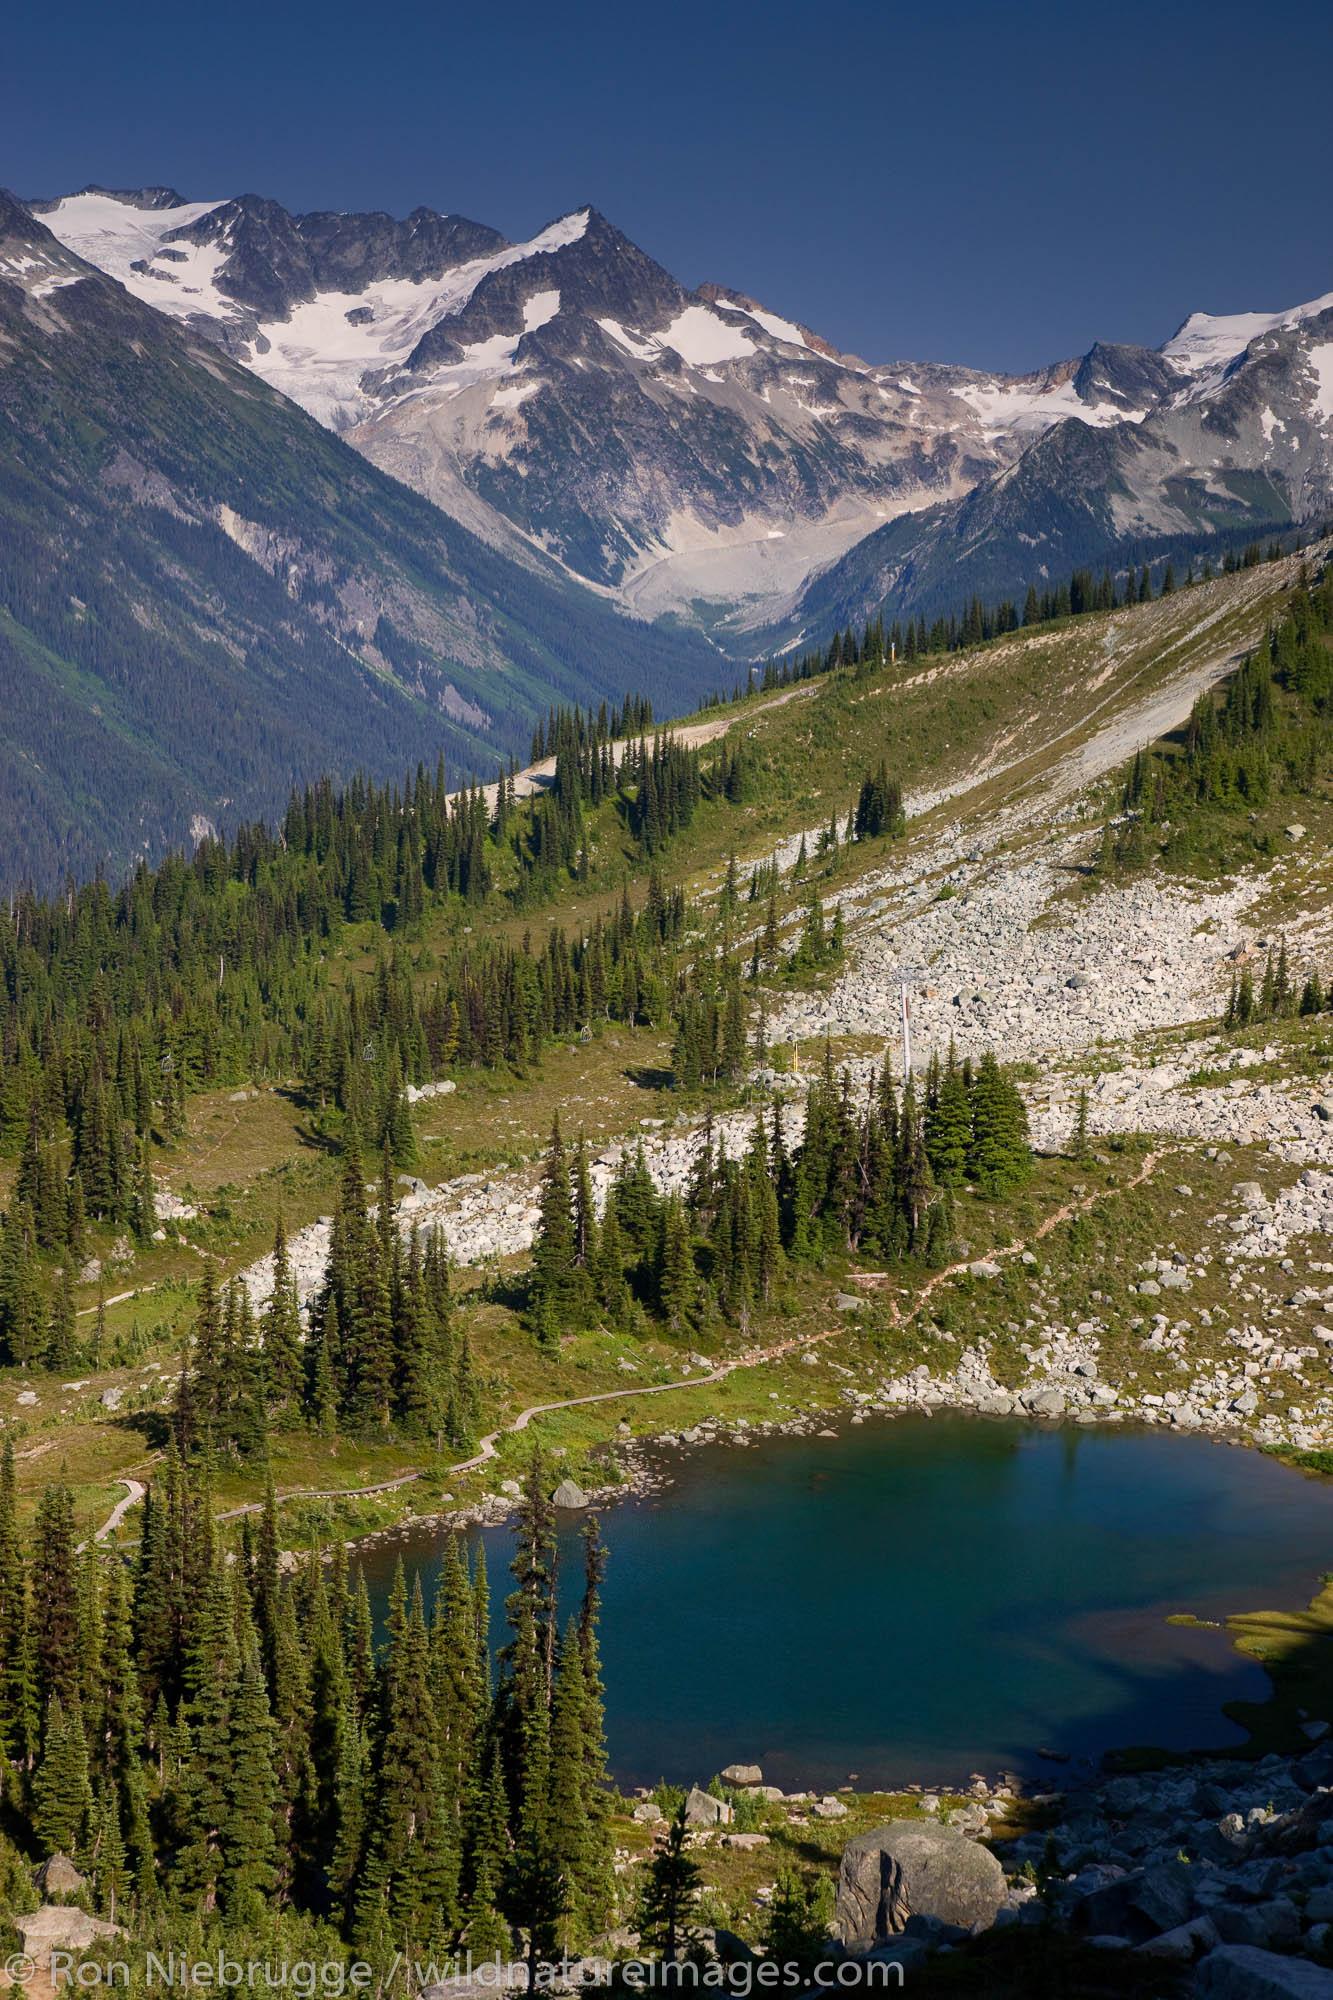 Views from the Harmony Lake Trail, Whistler Mountain, Whistler, British Columbia, Canada.